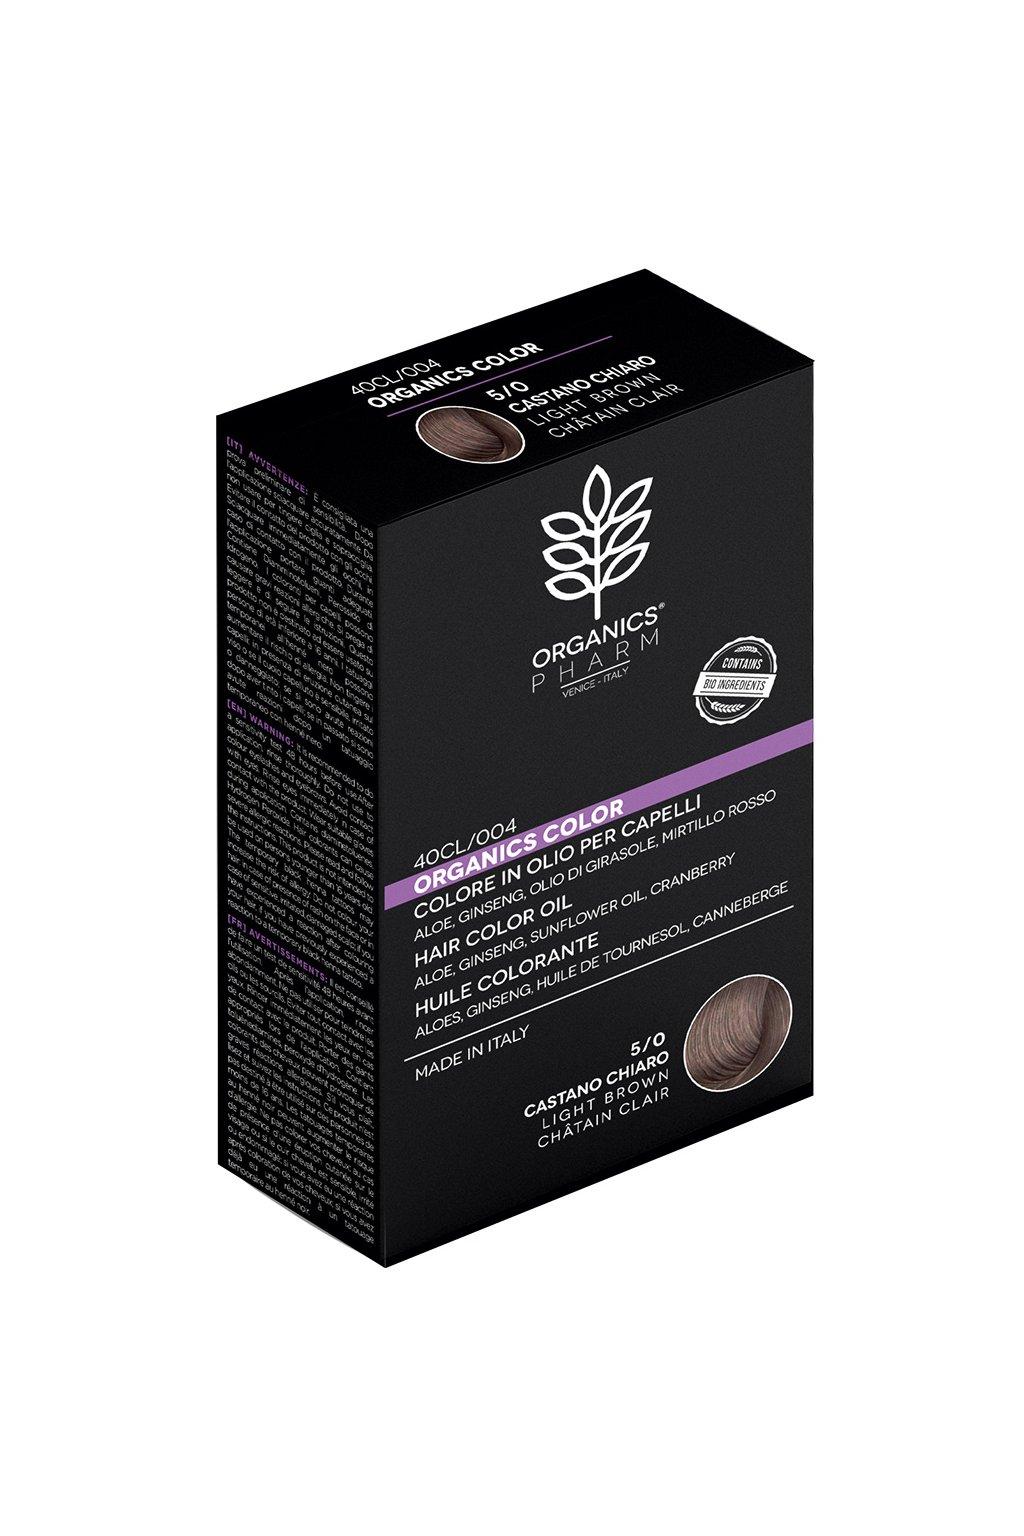 ORGANICS PHARM Organics Color Hair Color Oil 122ml 5 0 Light Brown